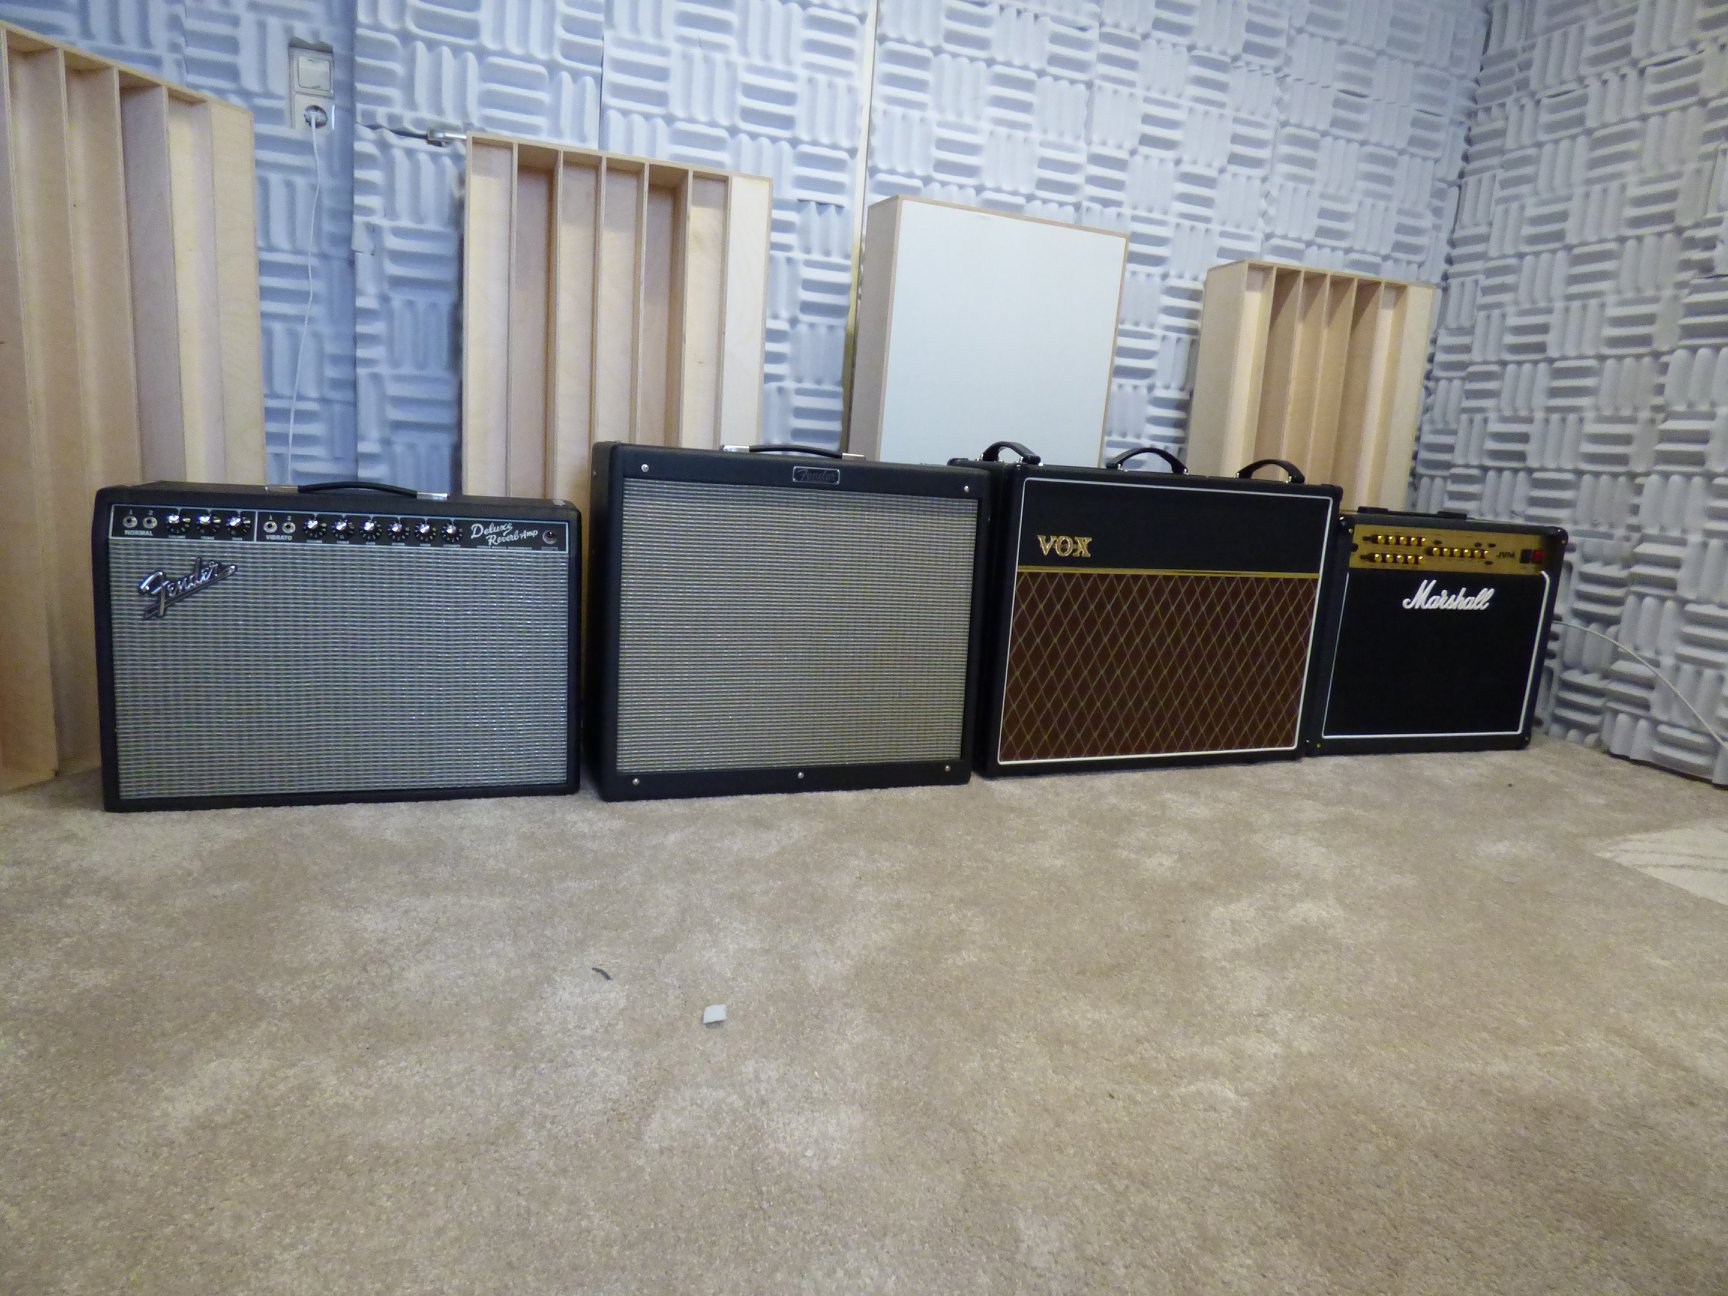 The most demanding tube guitar amps: VOX AC-30, Marshall JVM 215C, Fender Reverb Deluxe, Fender Hotrod Deville. Foto: Privat